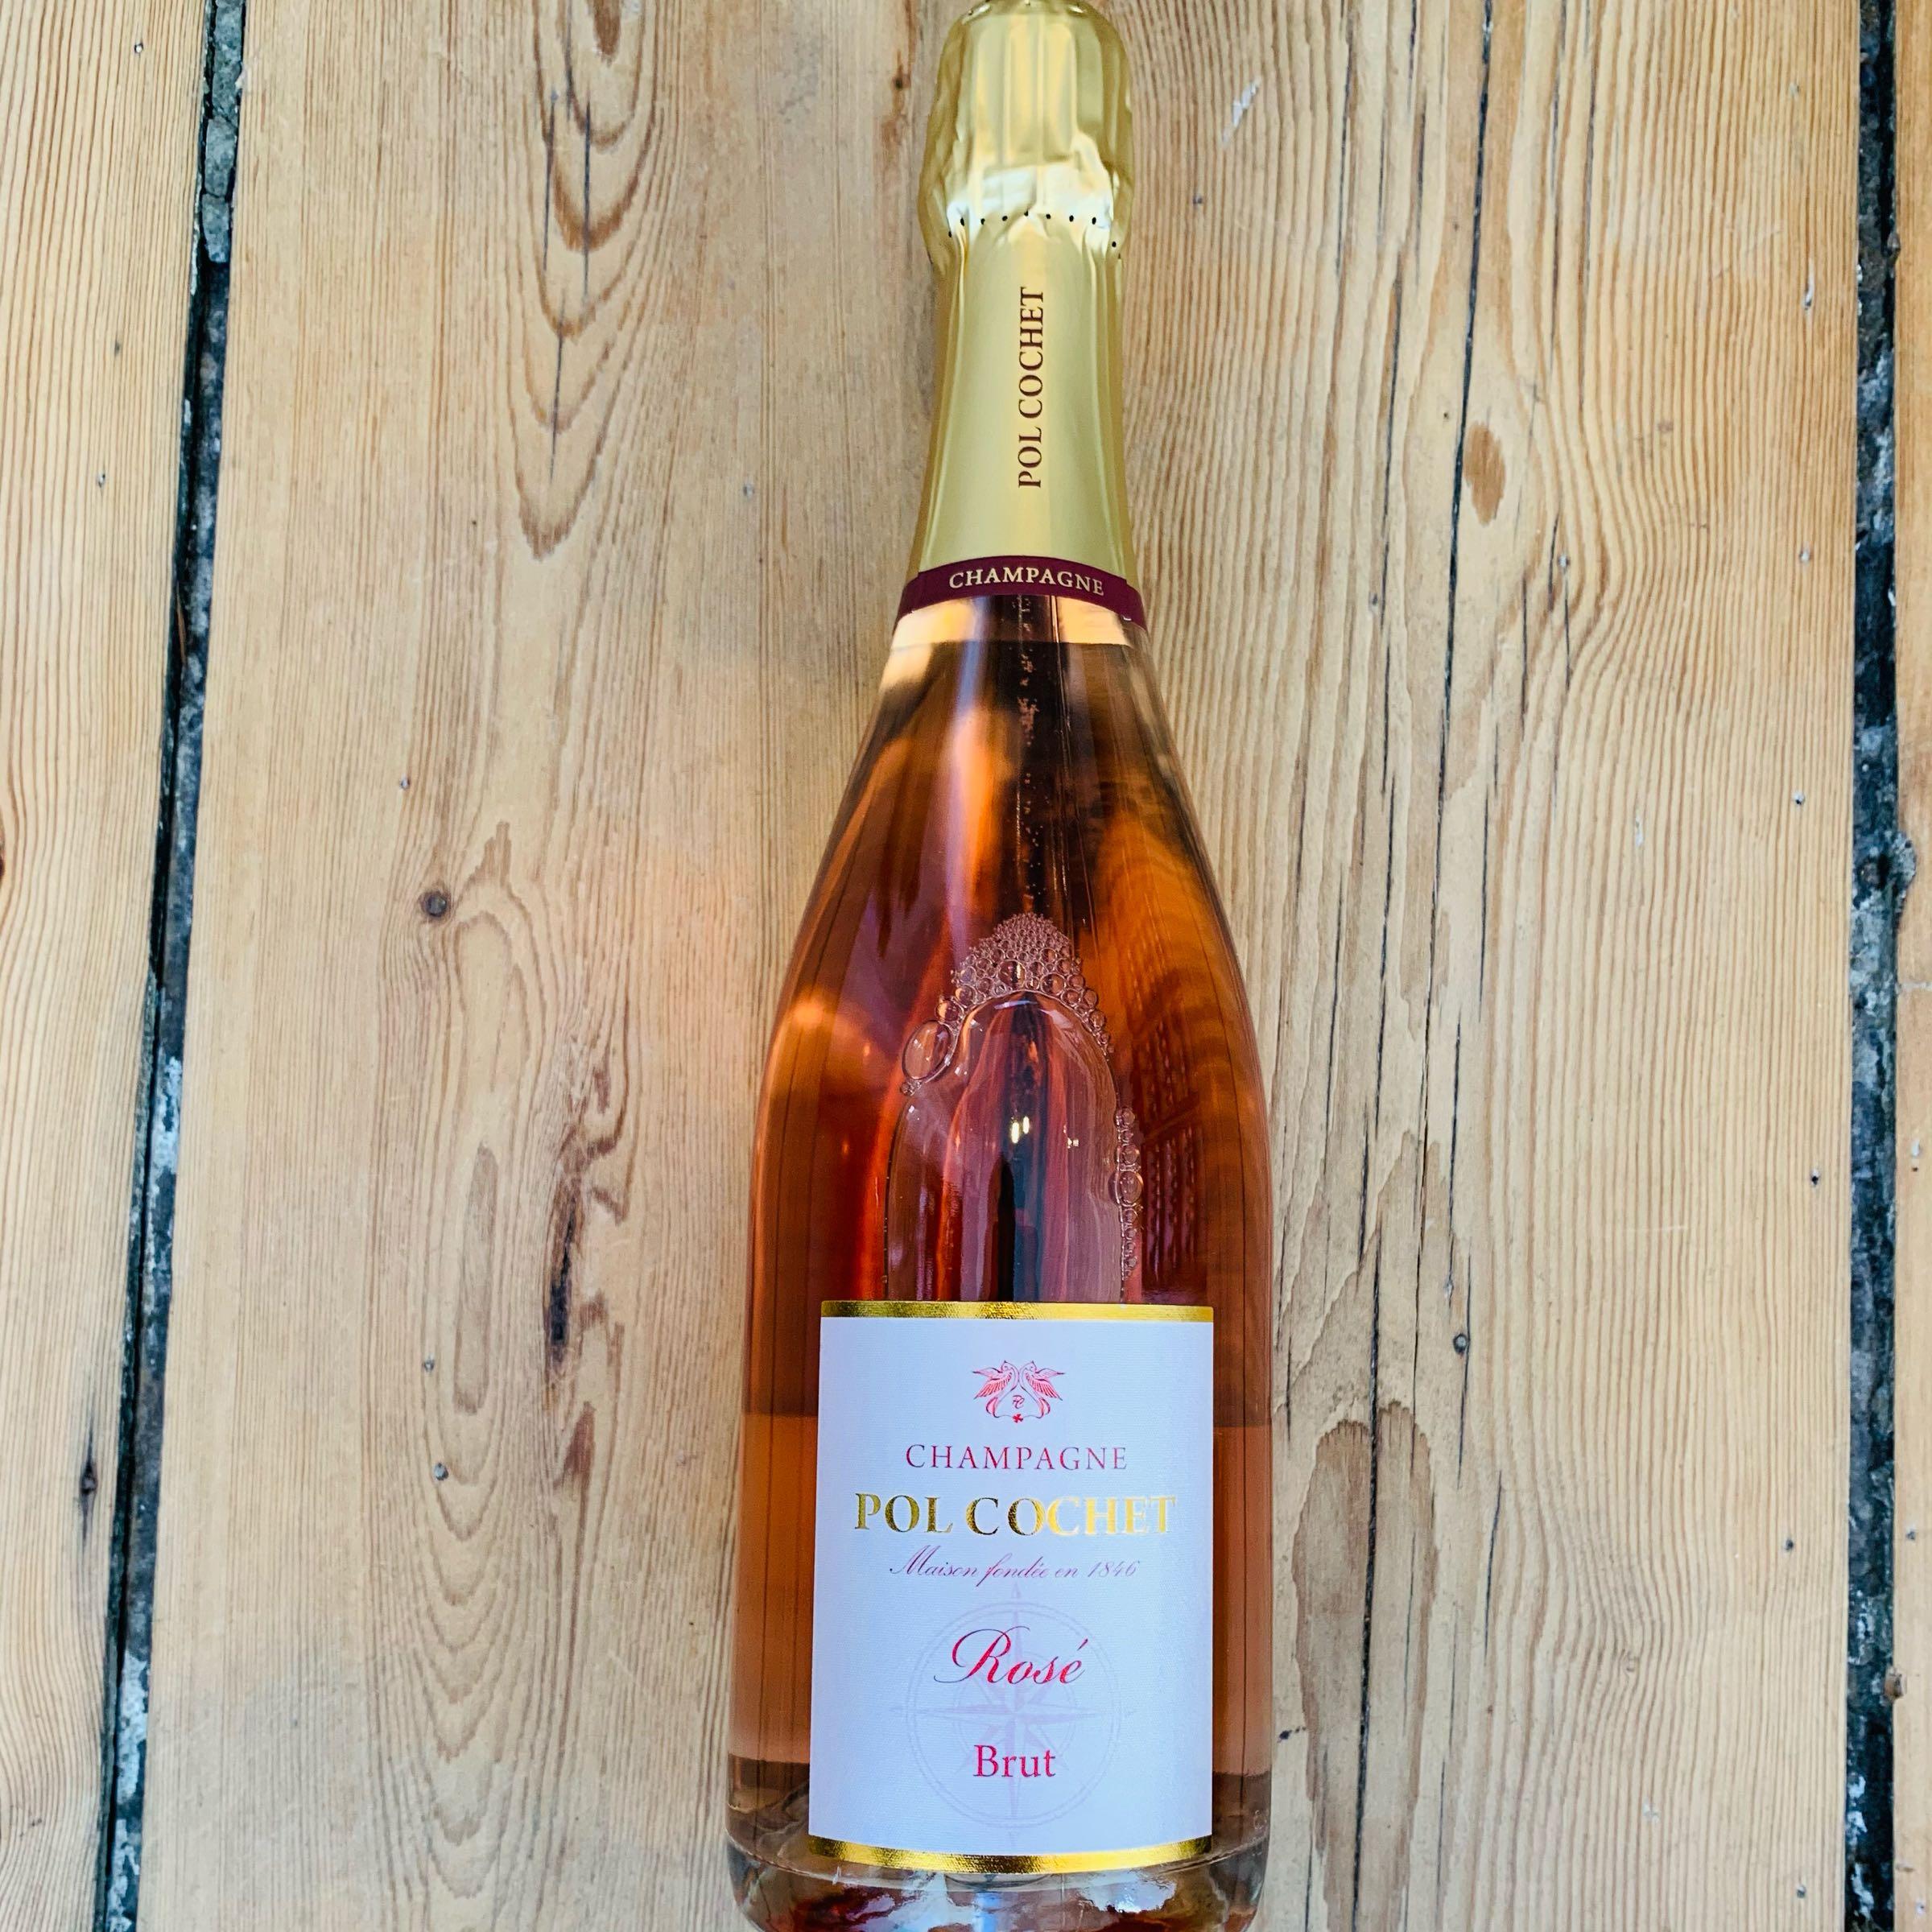 Pol Cochet Rosé Champagne